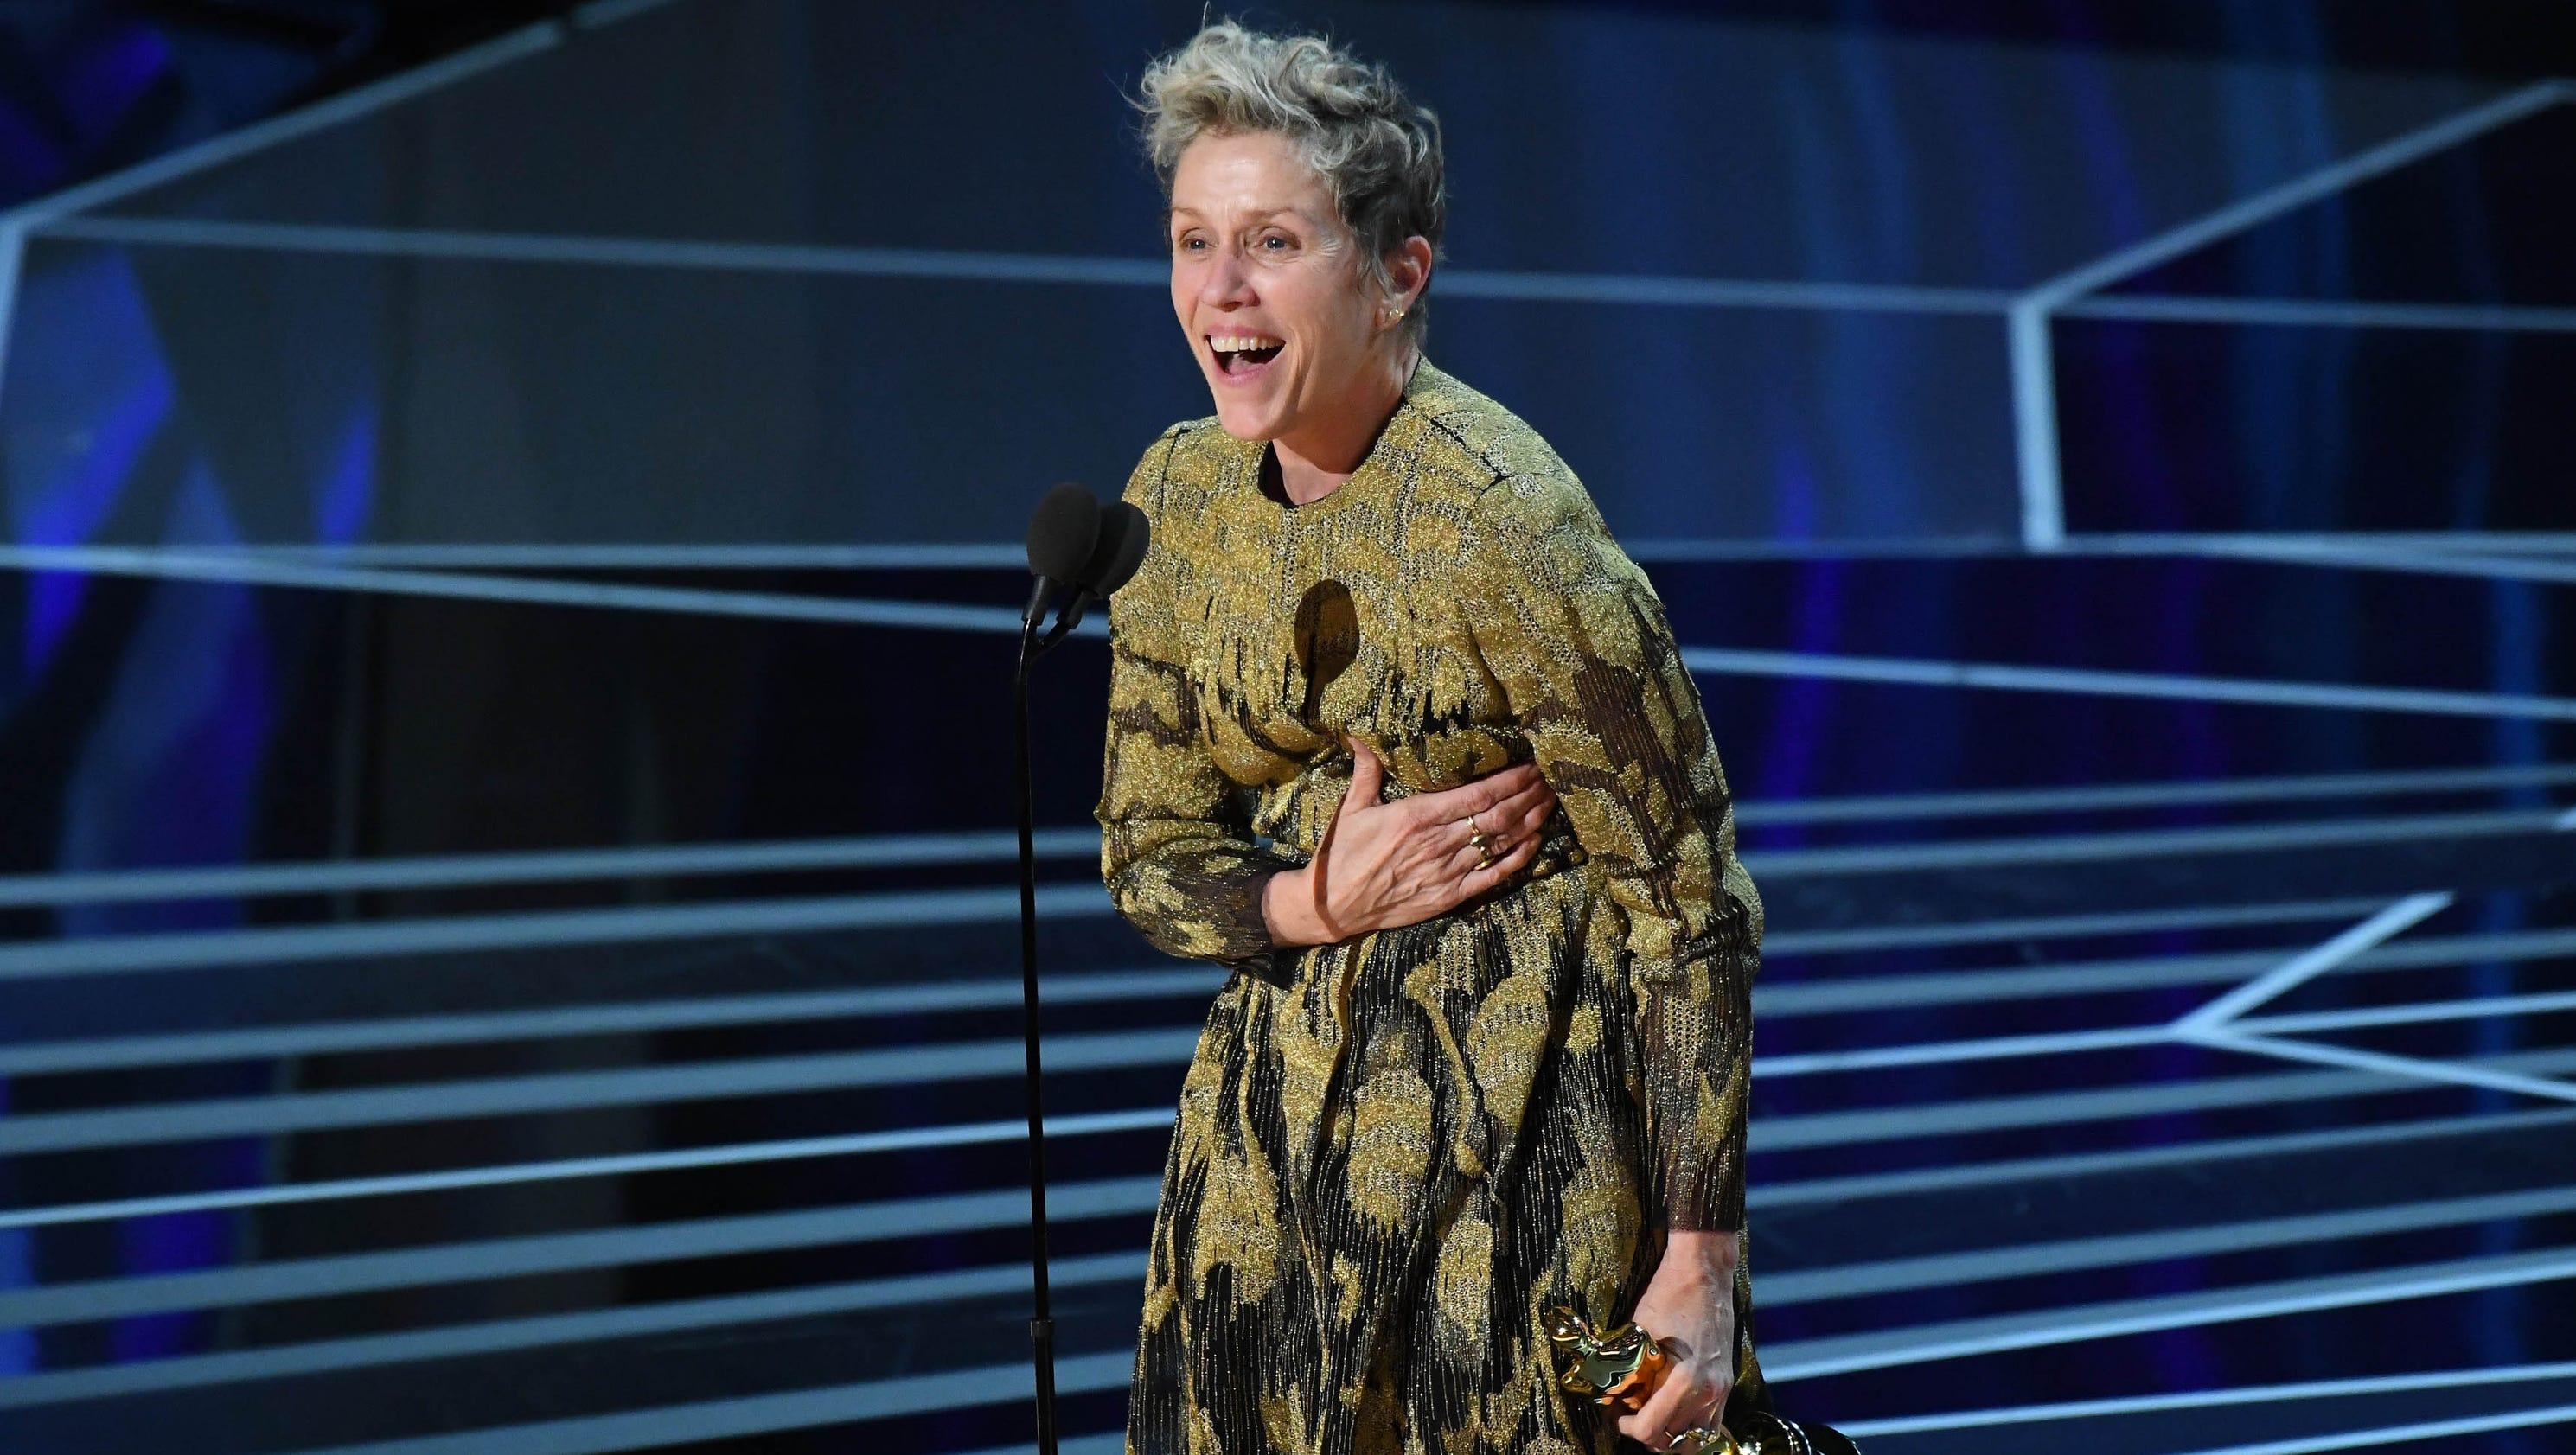 Man arrested for theft of Frances McDormand's Oscar; actress, trophy reunited